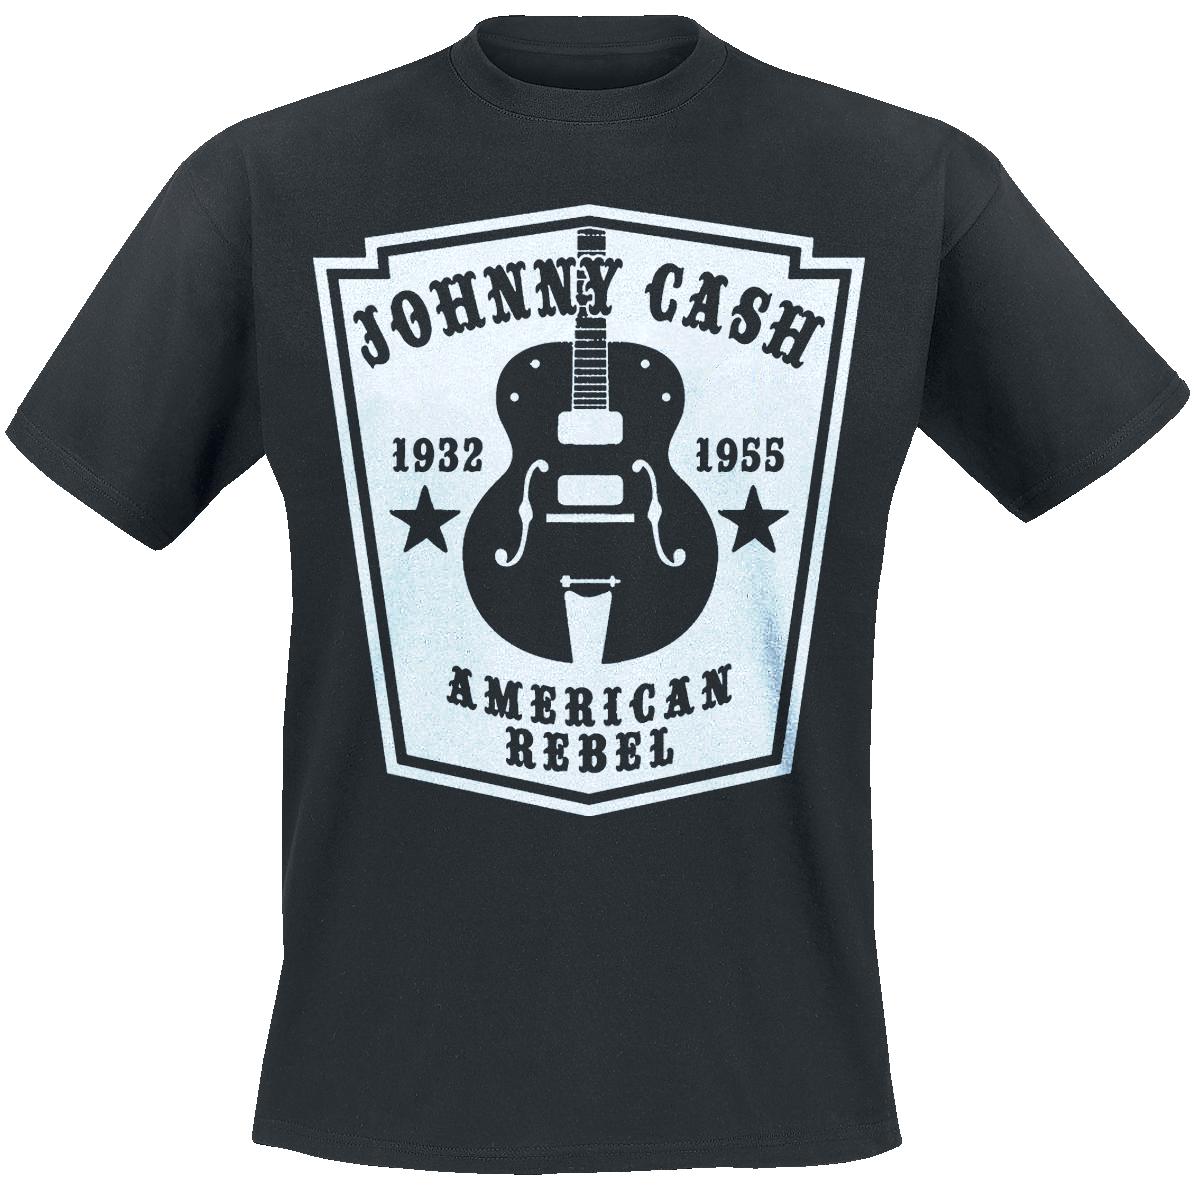 Johnny Cash - American Rebel - T-Shirt - black image